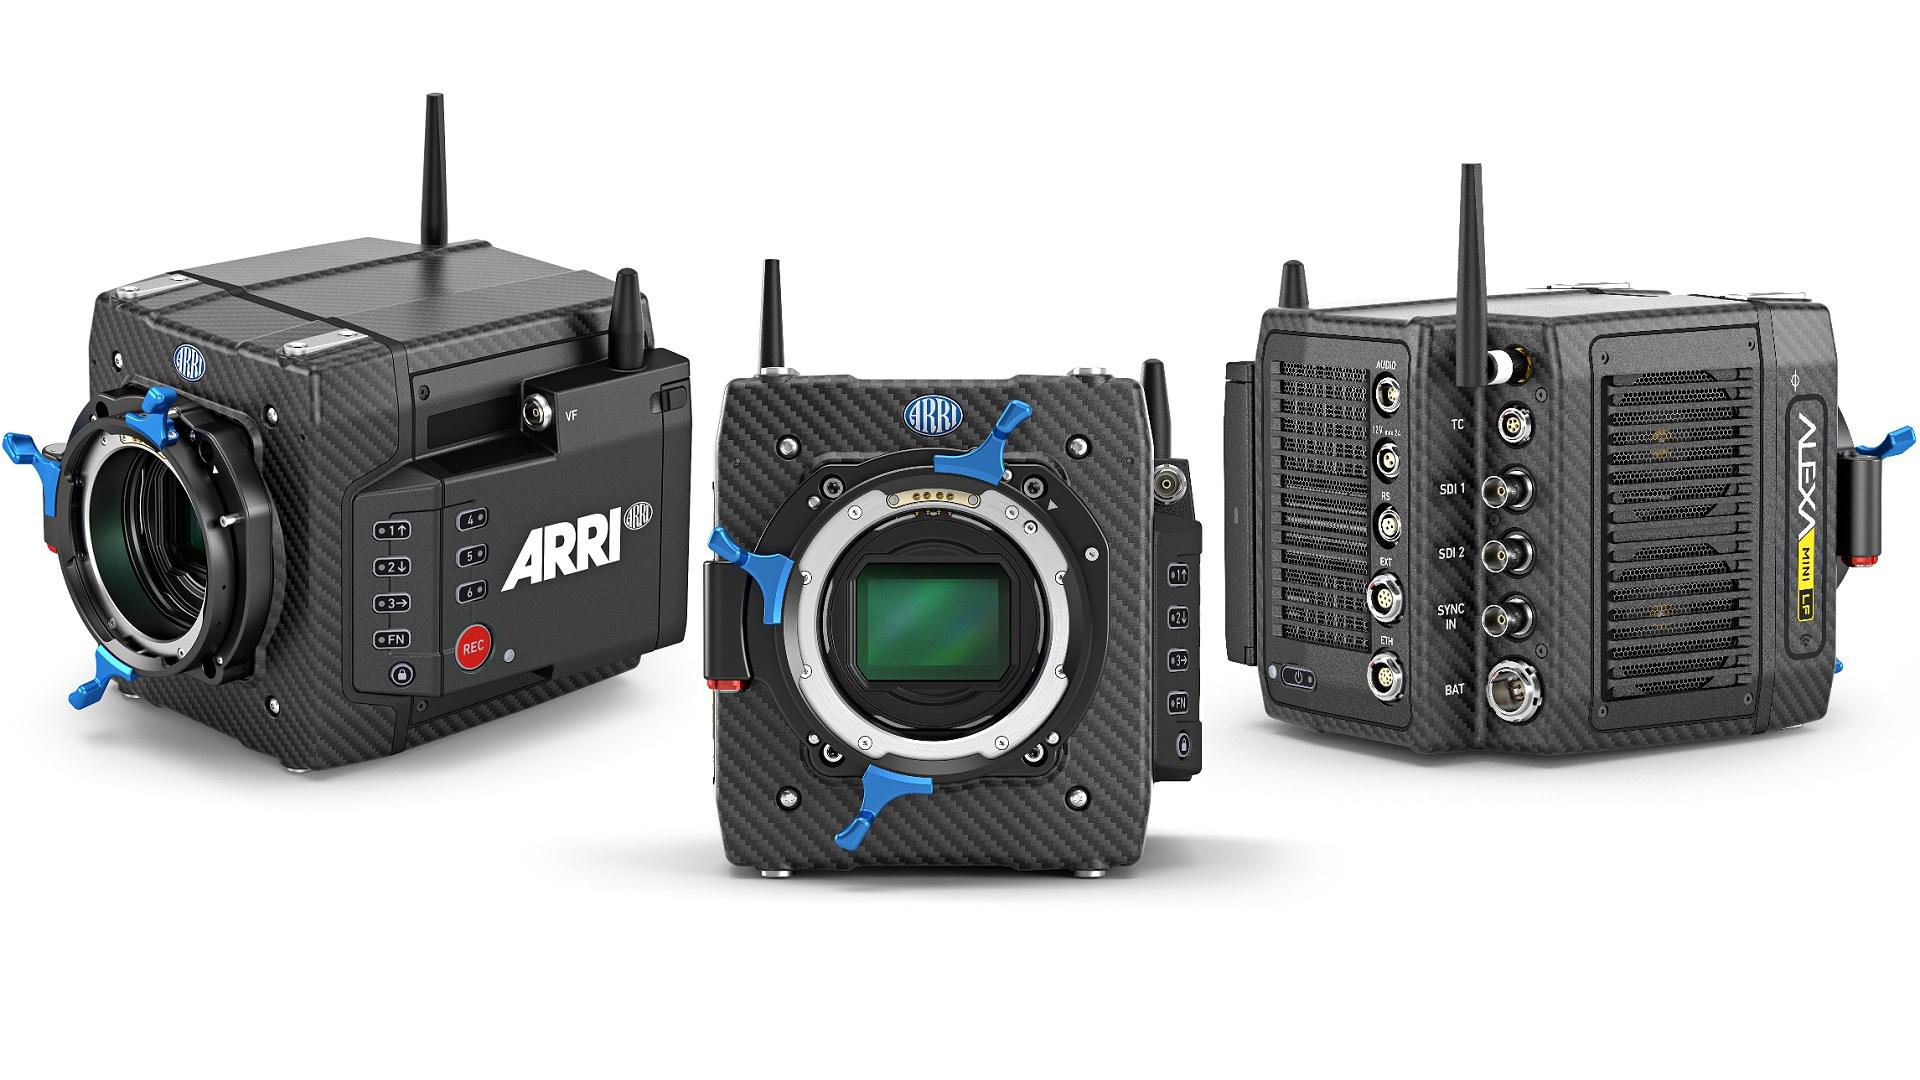 ARRI ALEXA Mini LF Announced - Large-Format 4 5K Sensor in